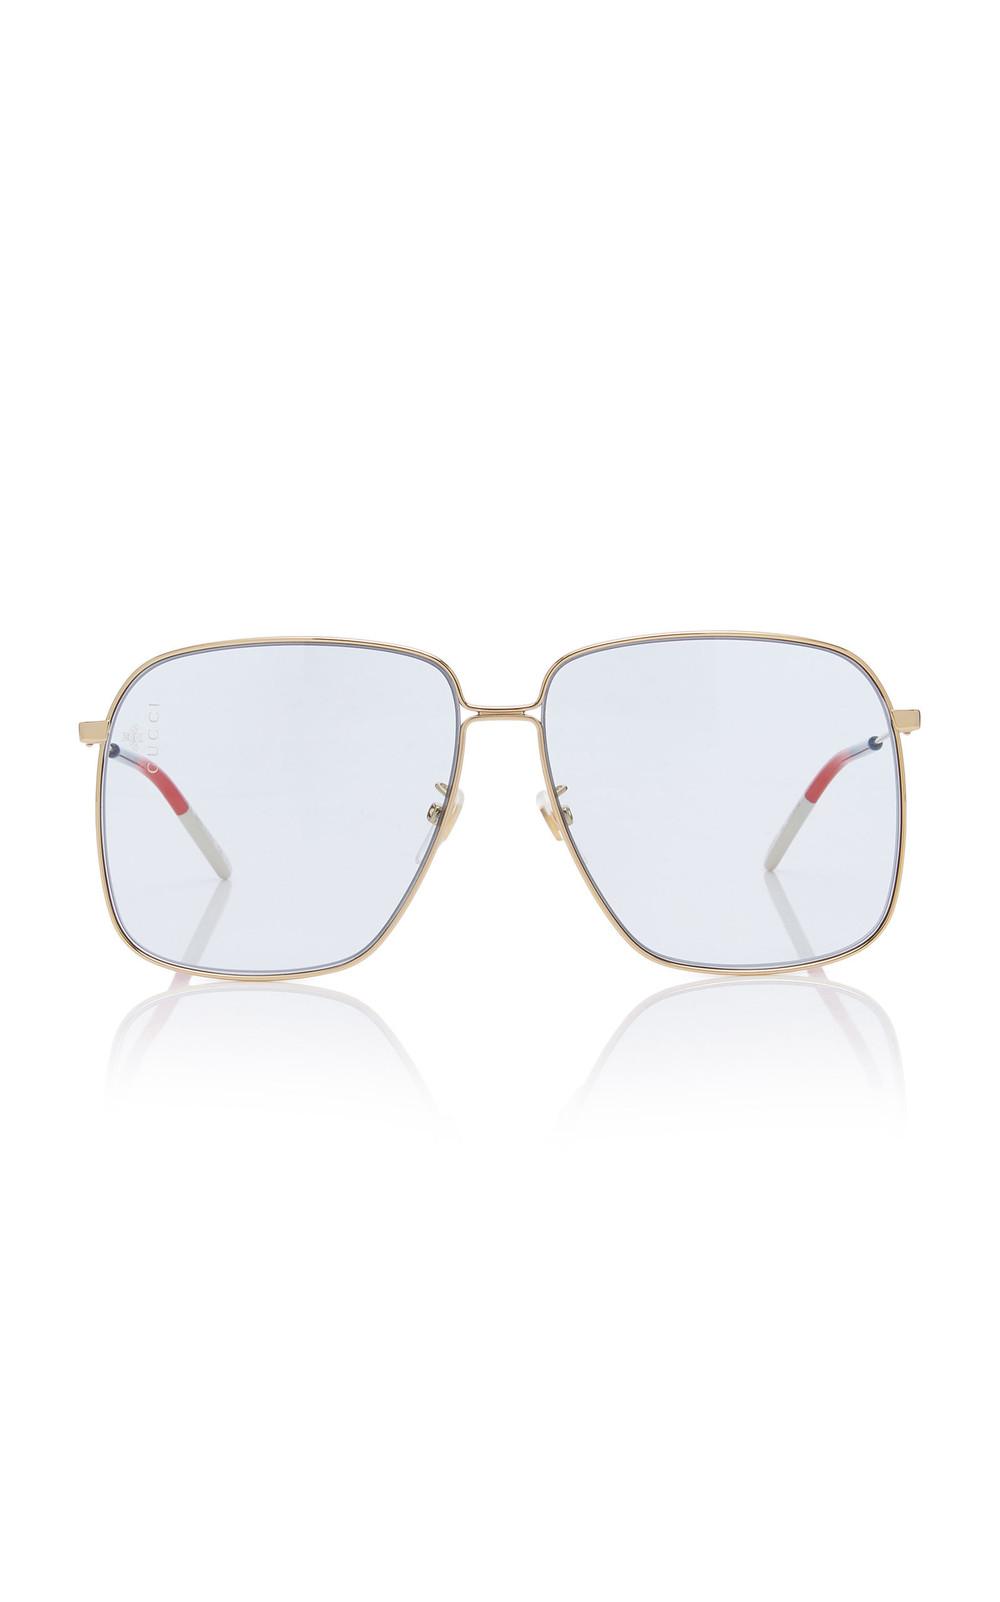 Gucci Sunglasses Glasant Oversized Metal Square-Frame Sunglasses in blue